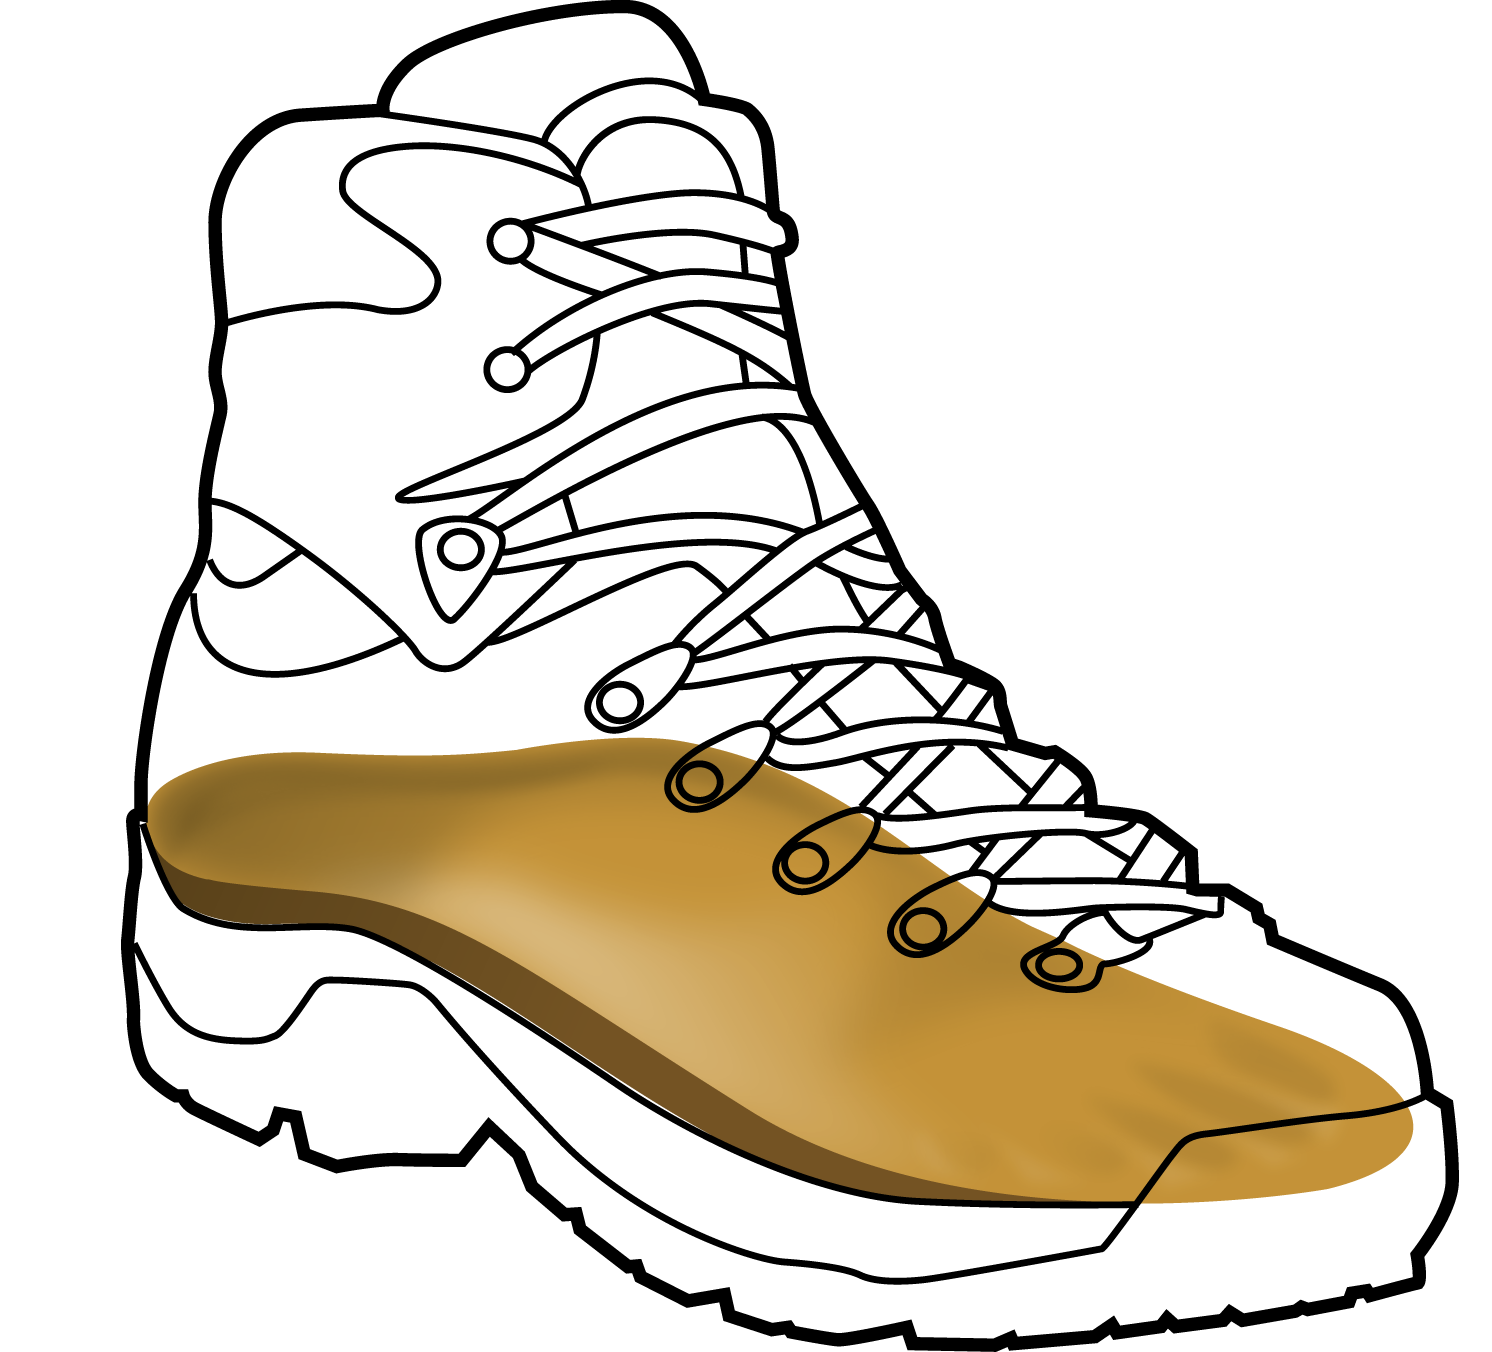 1492x1352 Hiking Boot